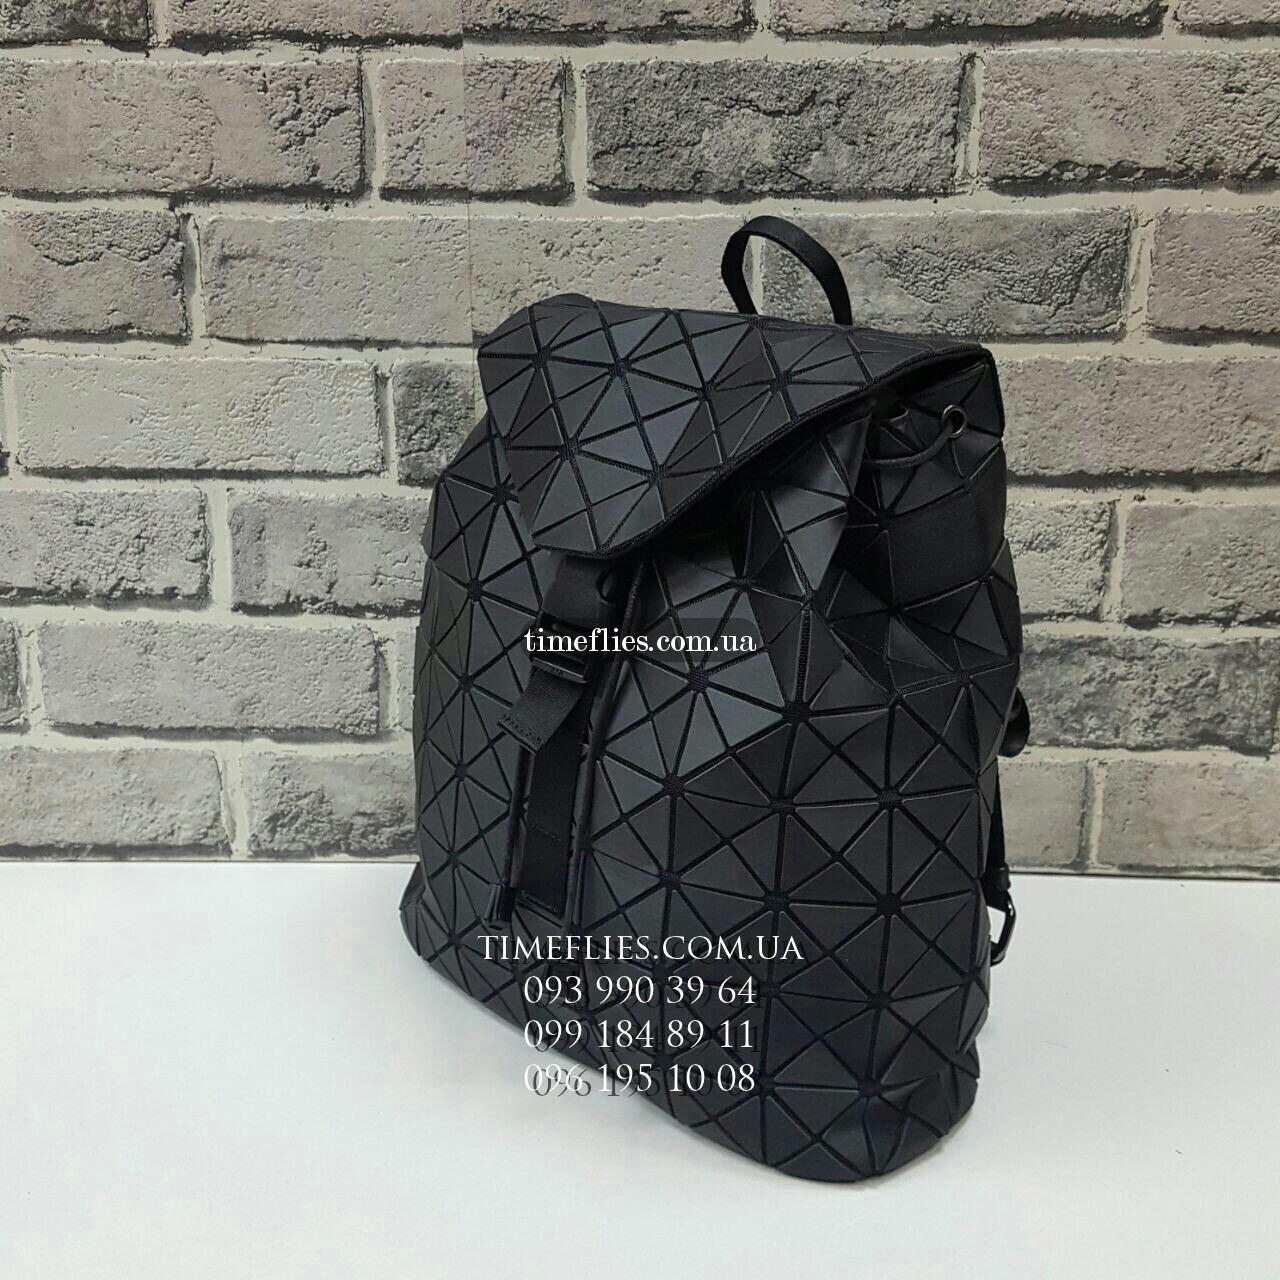 Рюкзак Bao Bao Issey Miyake  №2